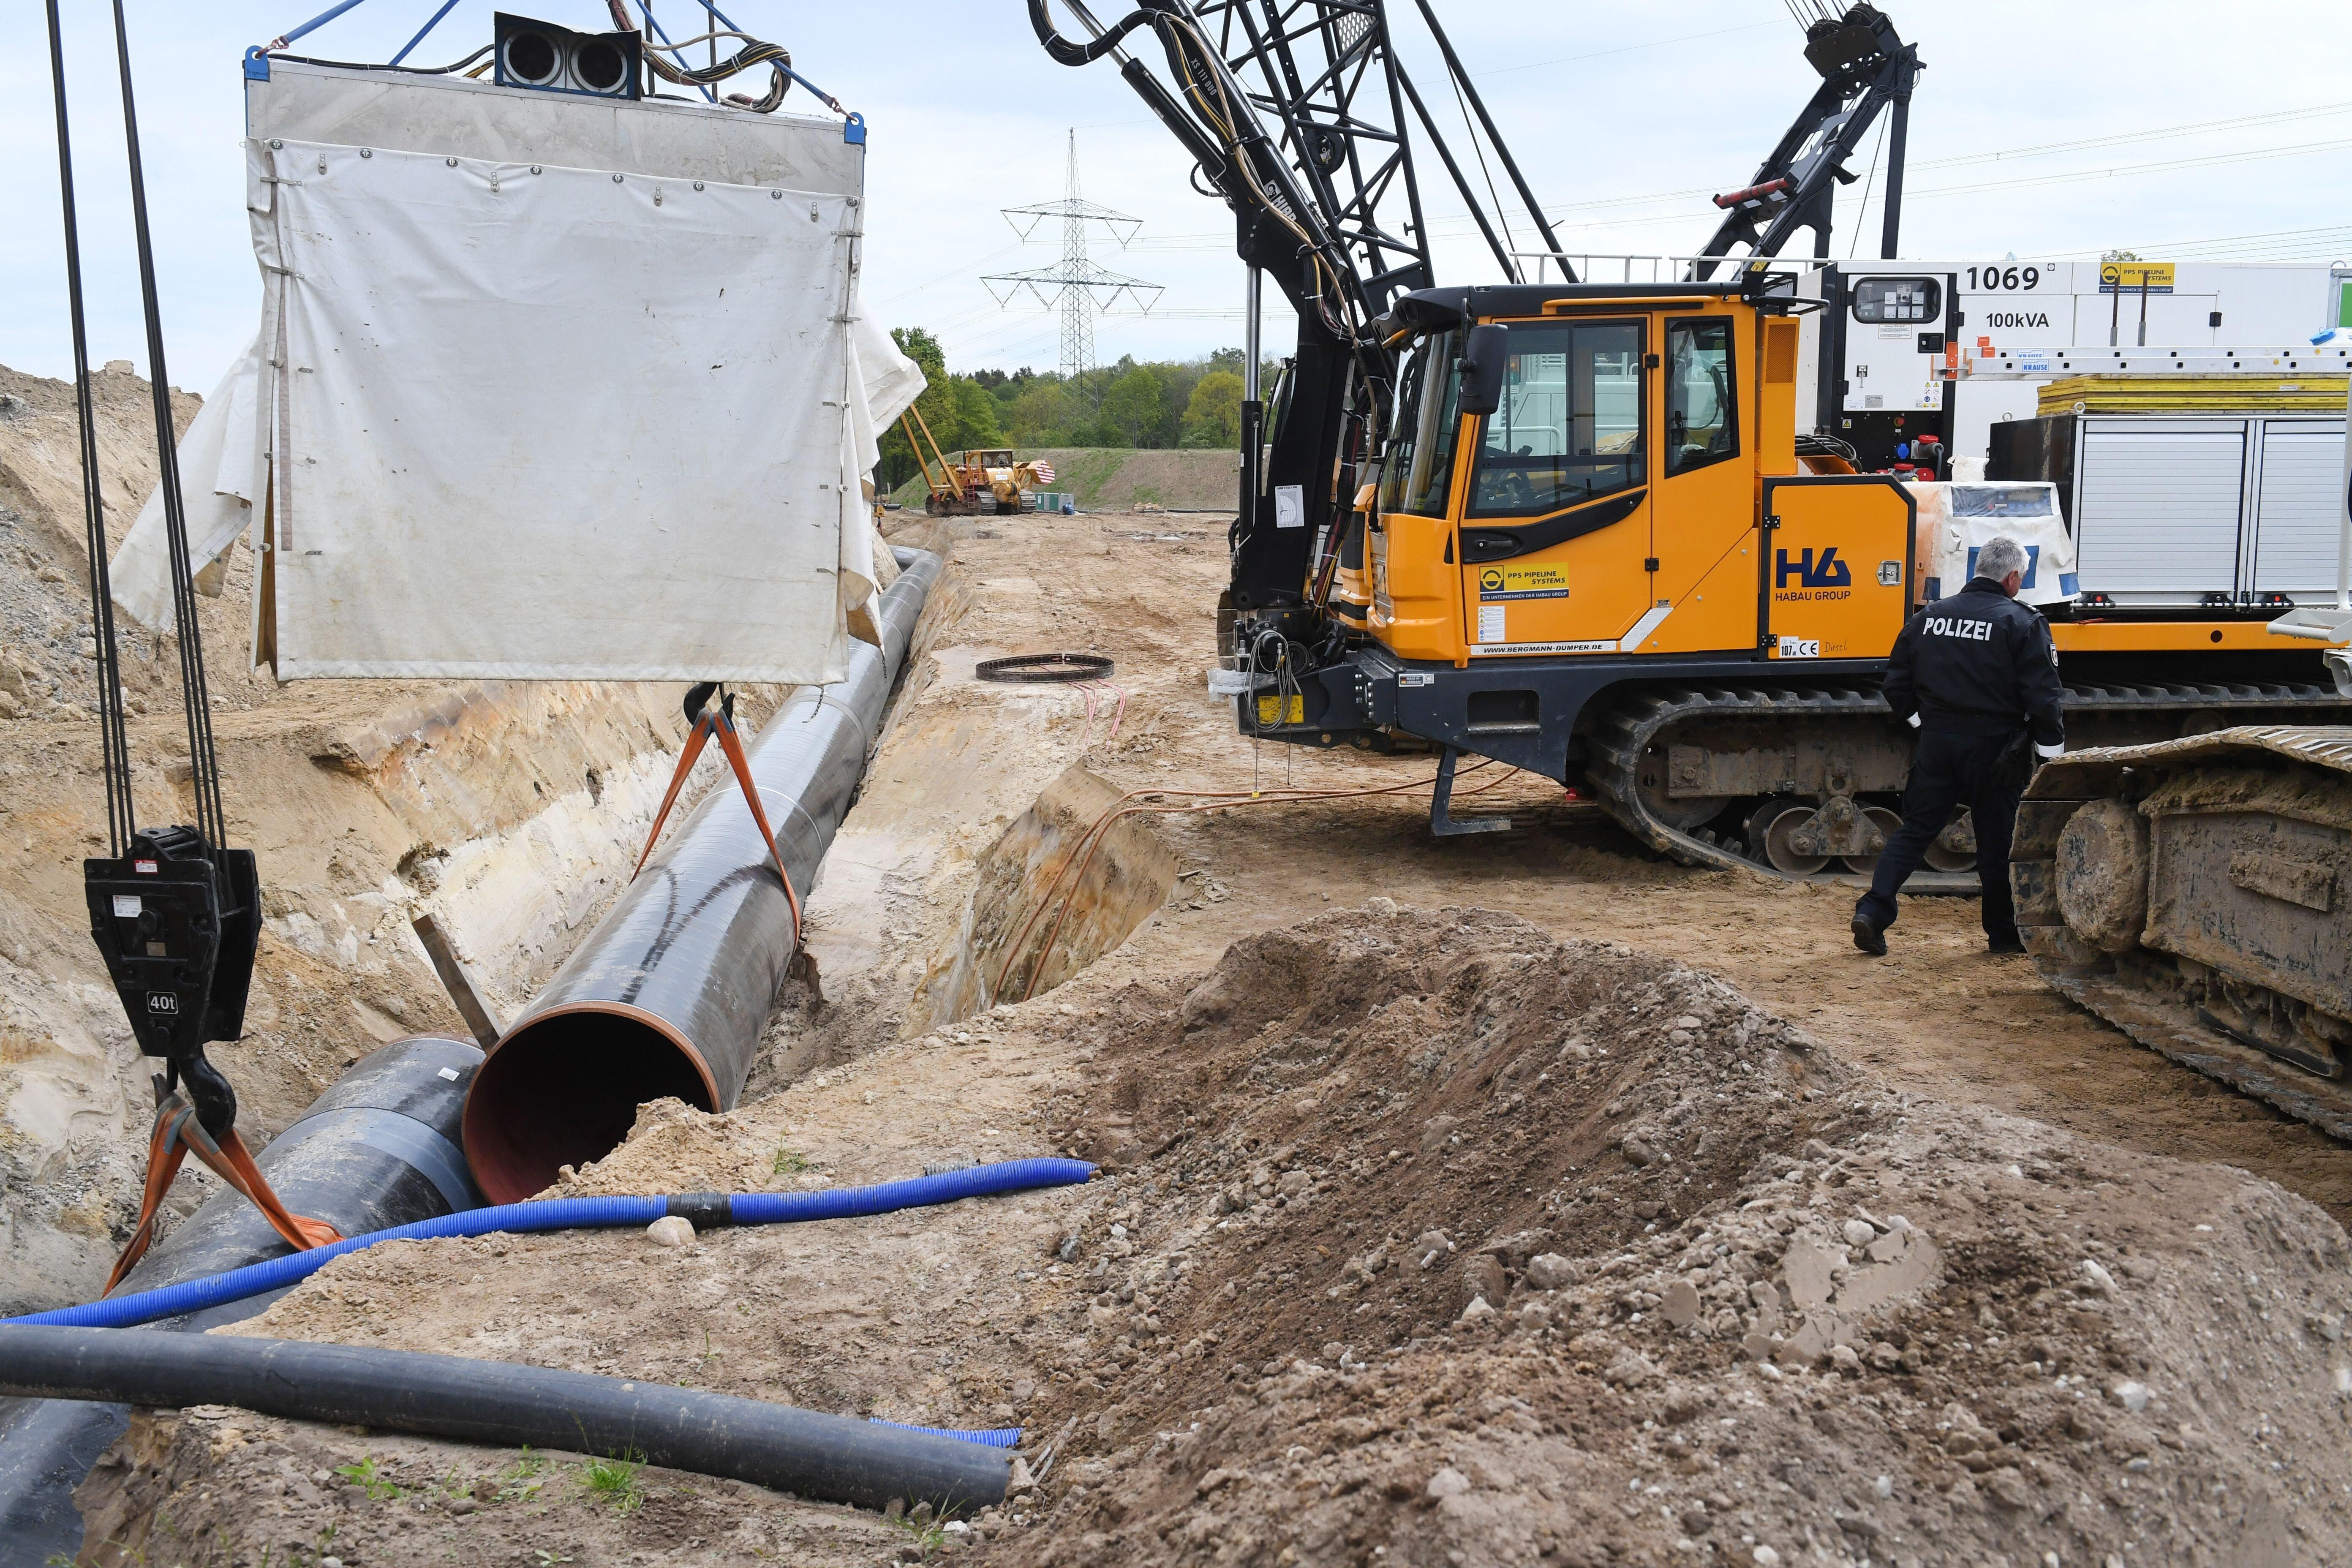 O Τσίπρας στη Βουλγαρία για την έναρξη κατασκευής του αγωγού